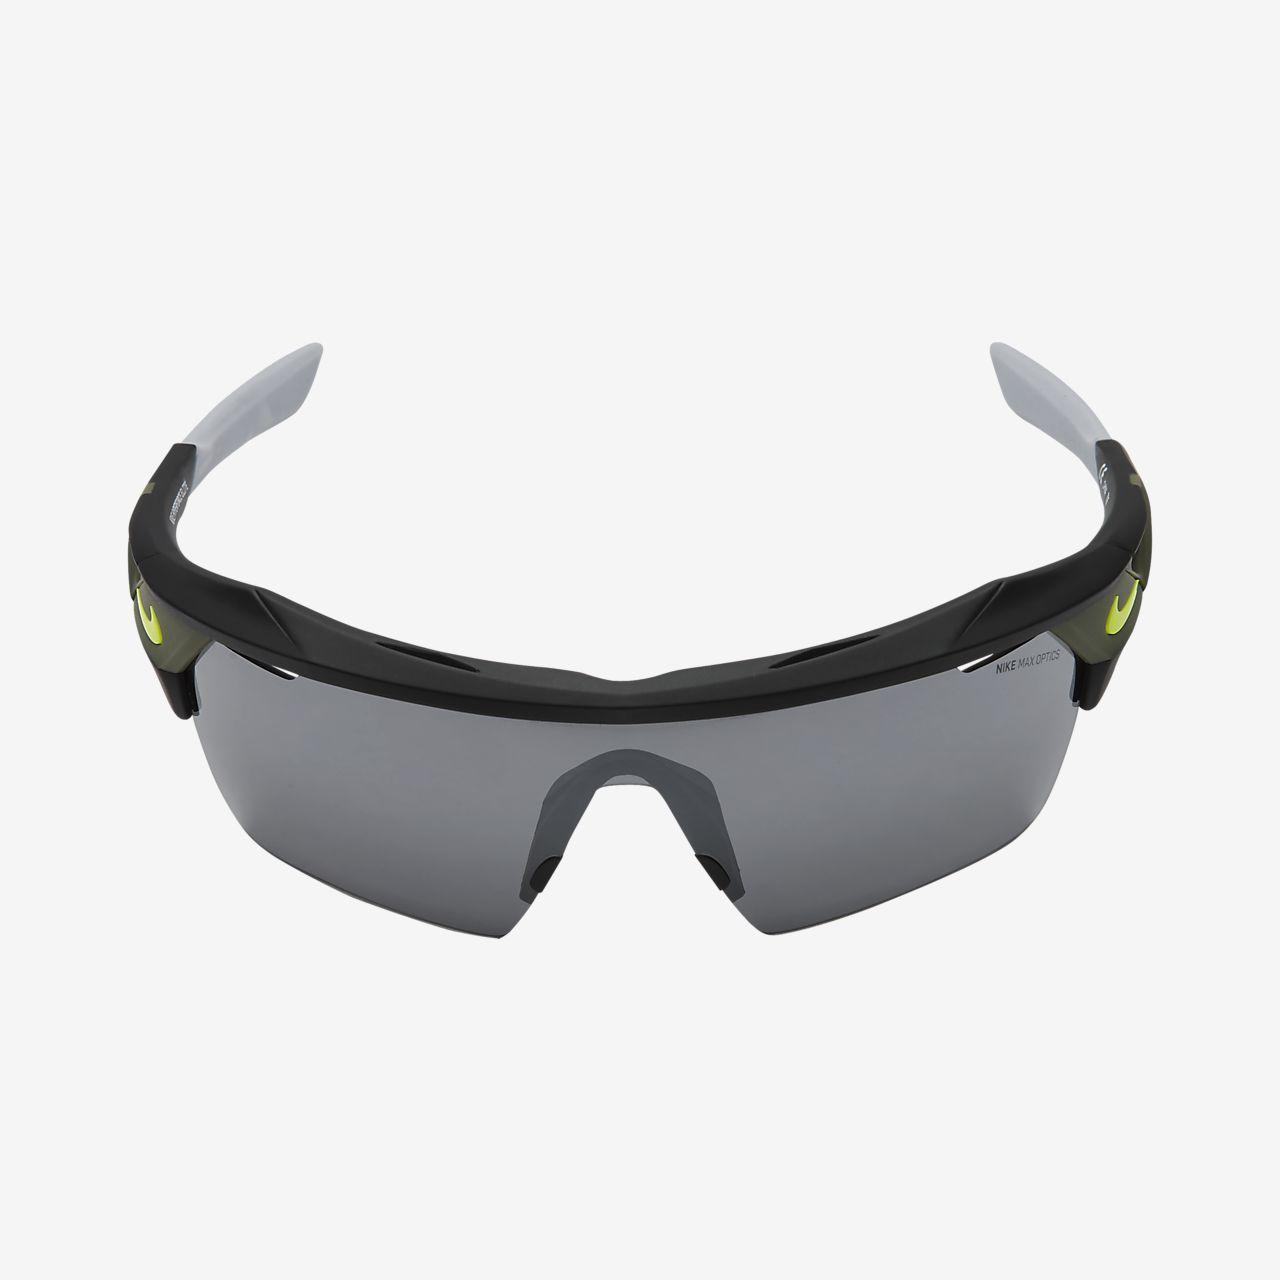 Nike Hyperforce Elite Sunglasses